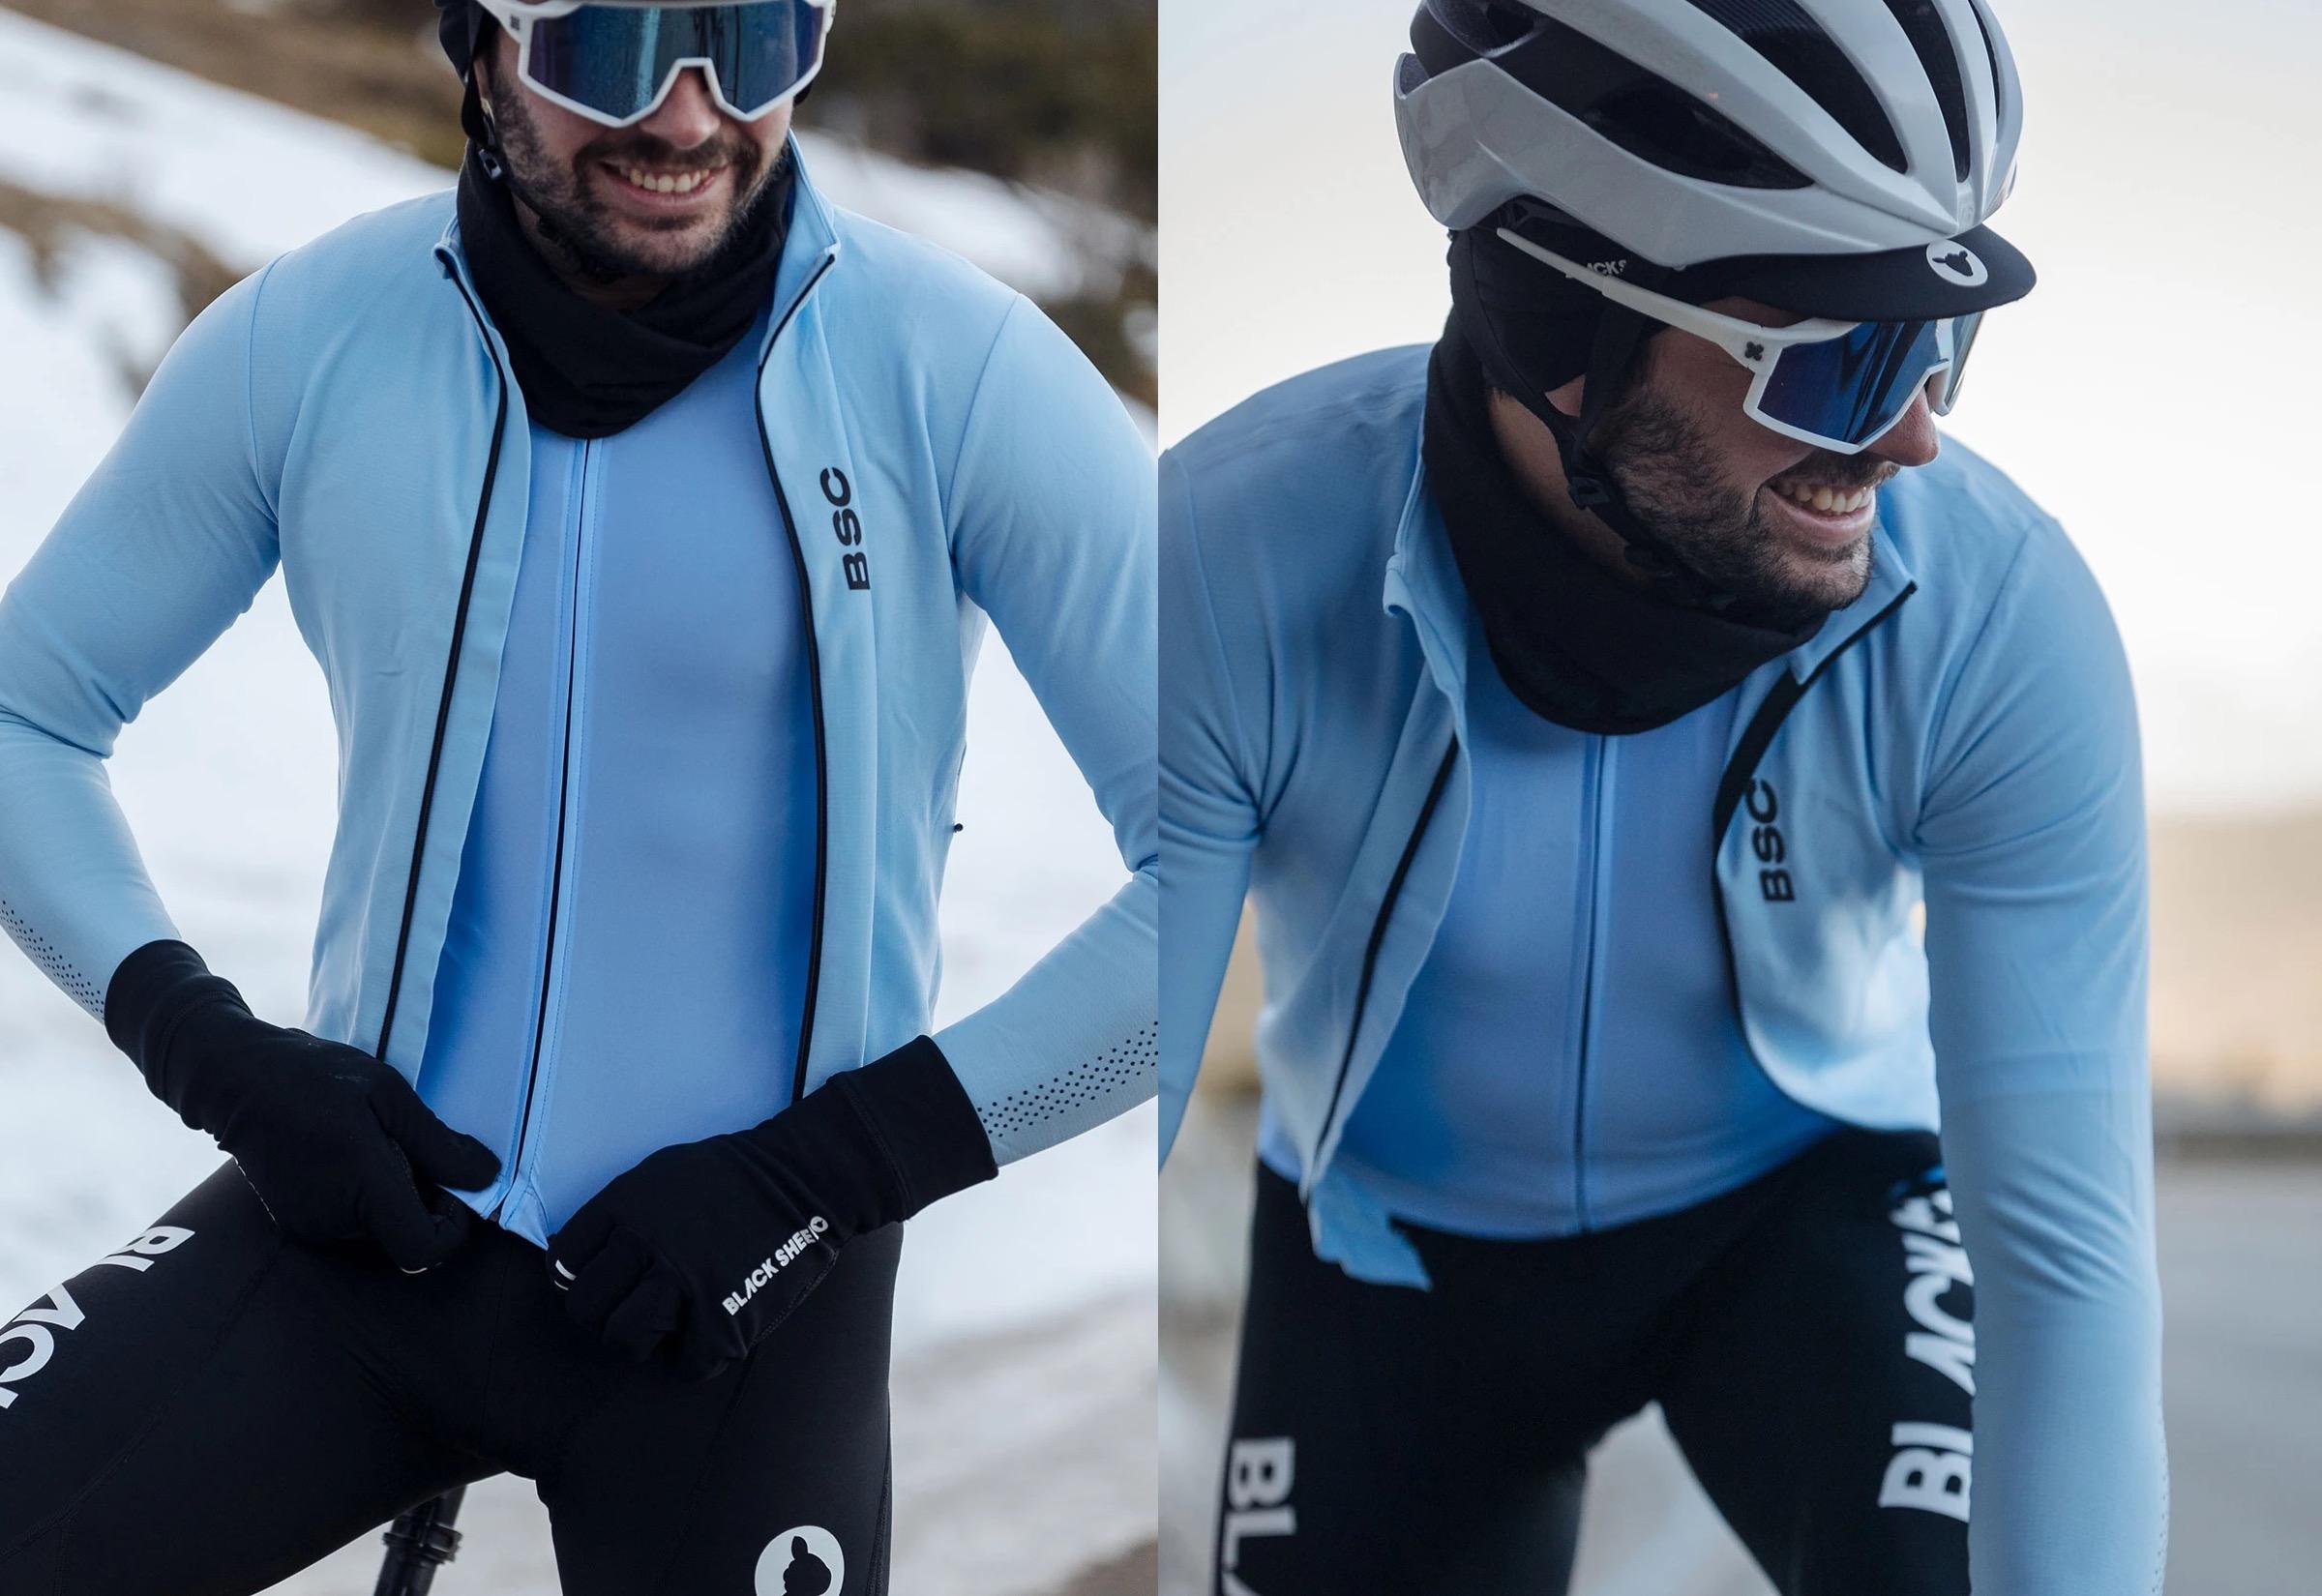 Men's Elements LS Thermal Jersey / Vista Blue